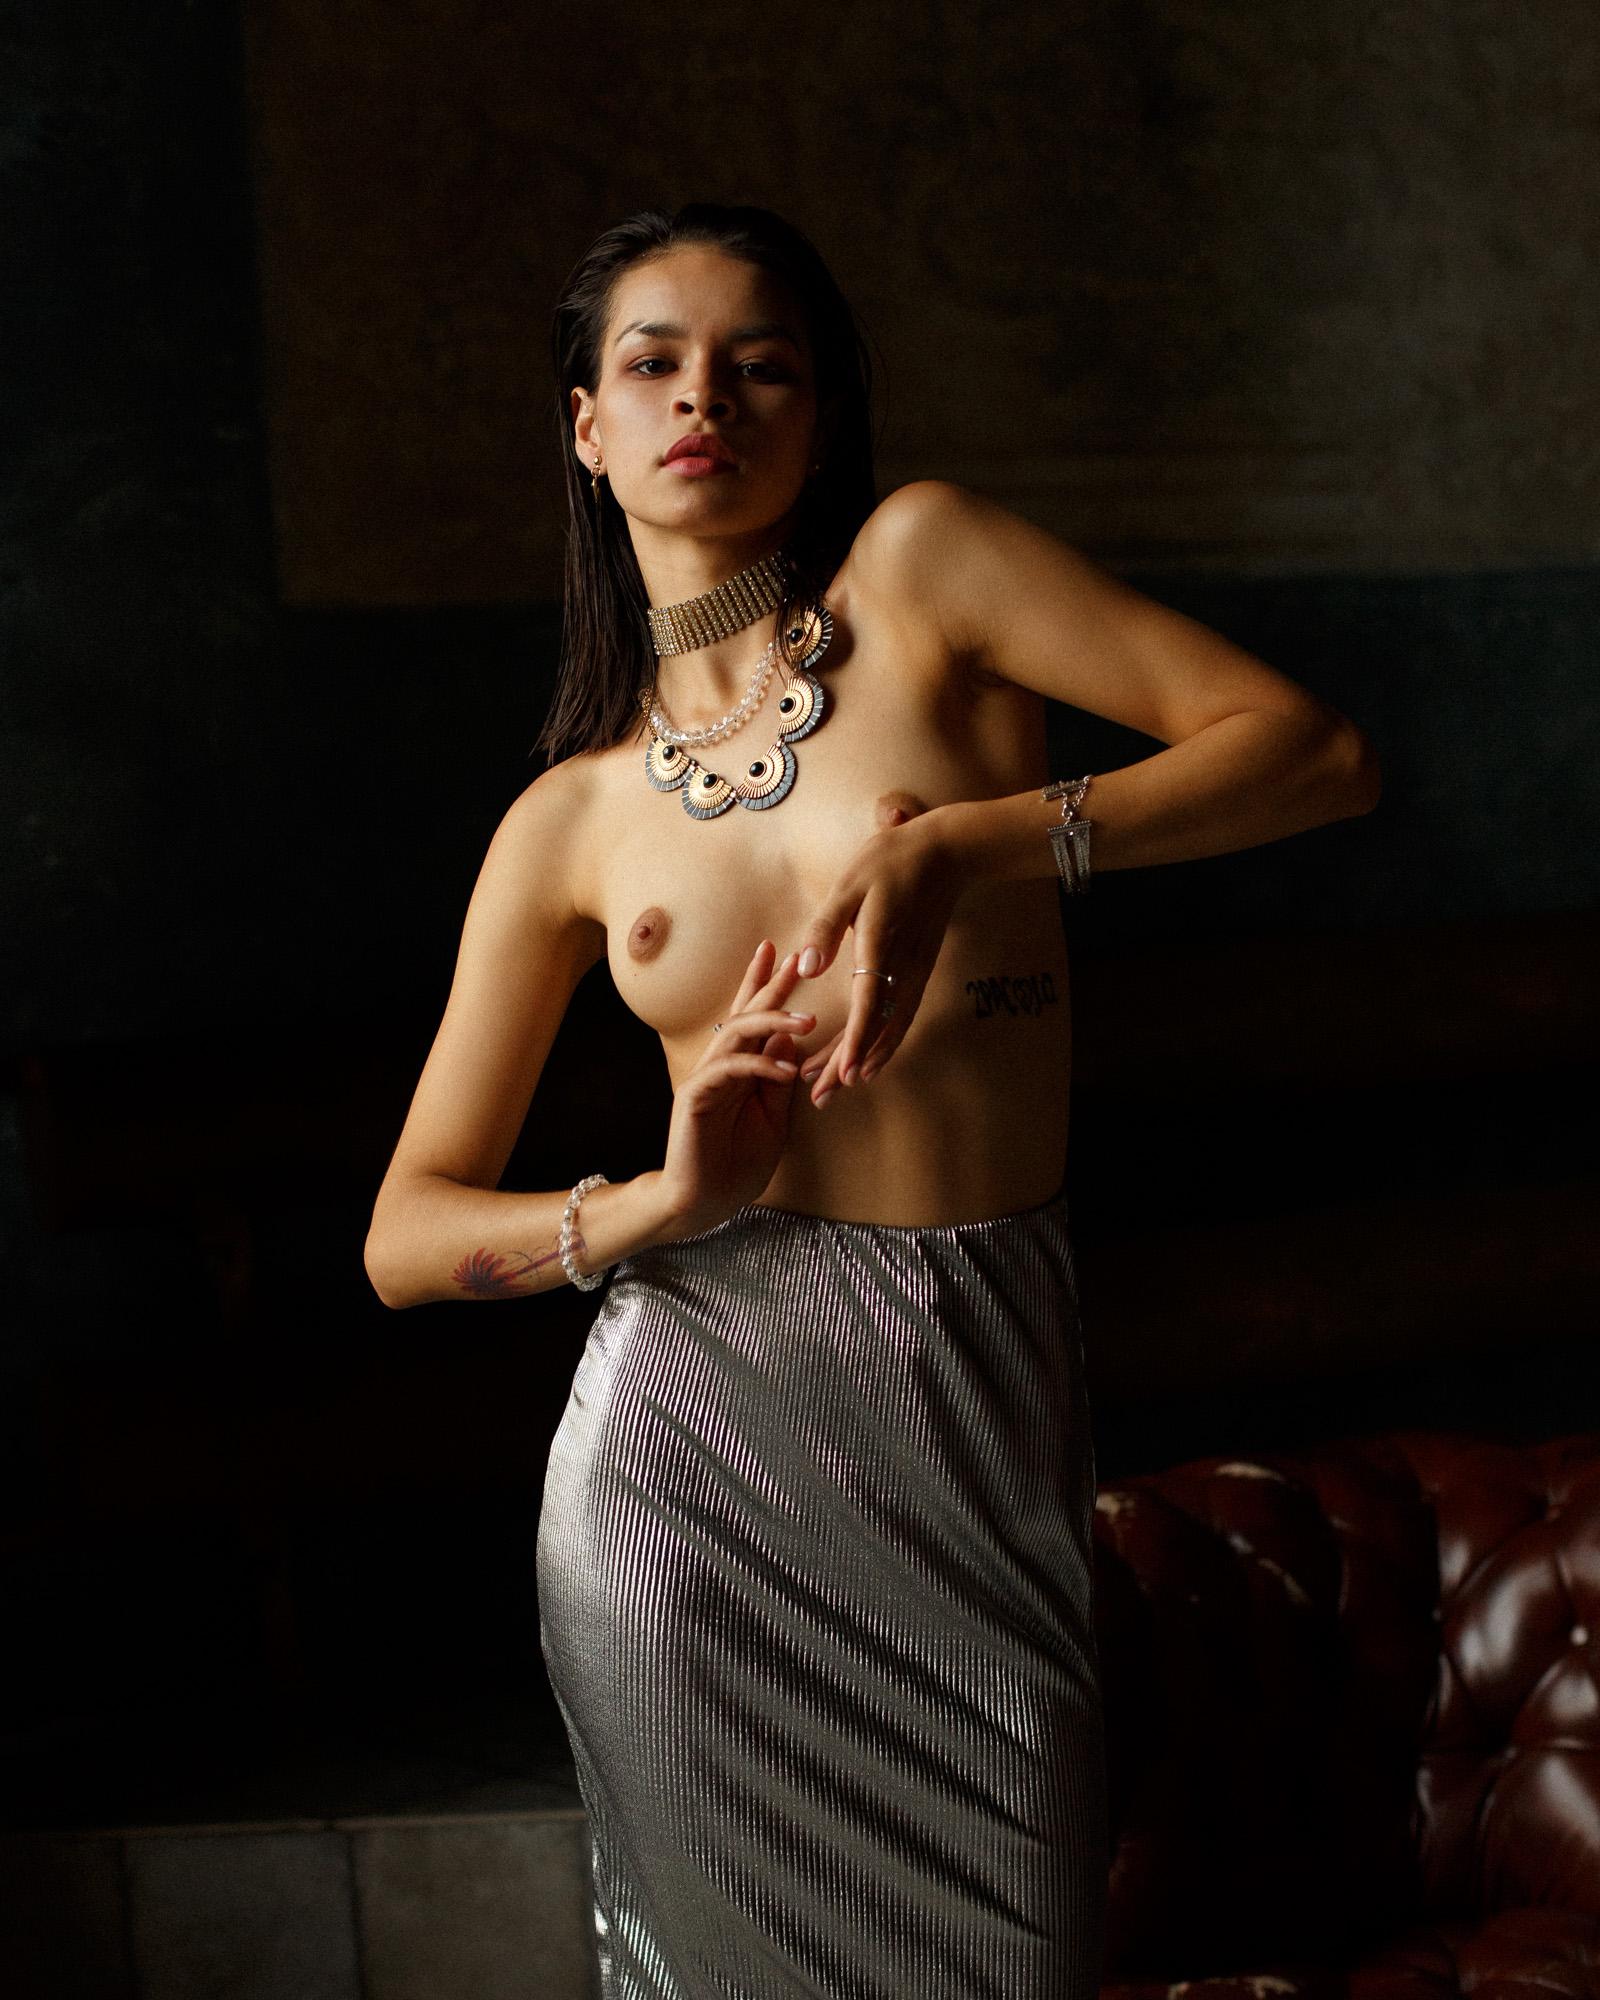 Iuliia Bast aka Julia Star by Igor Shevchuk